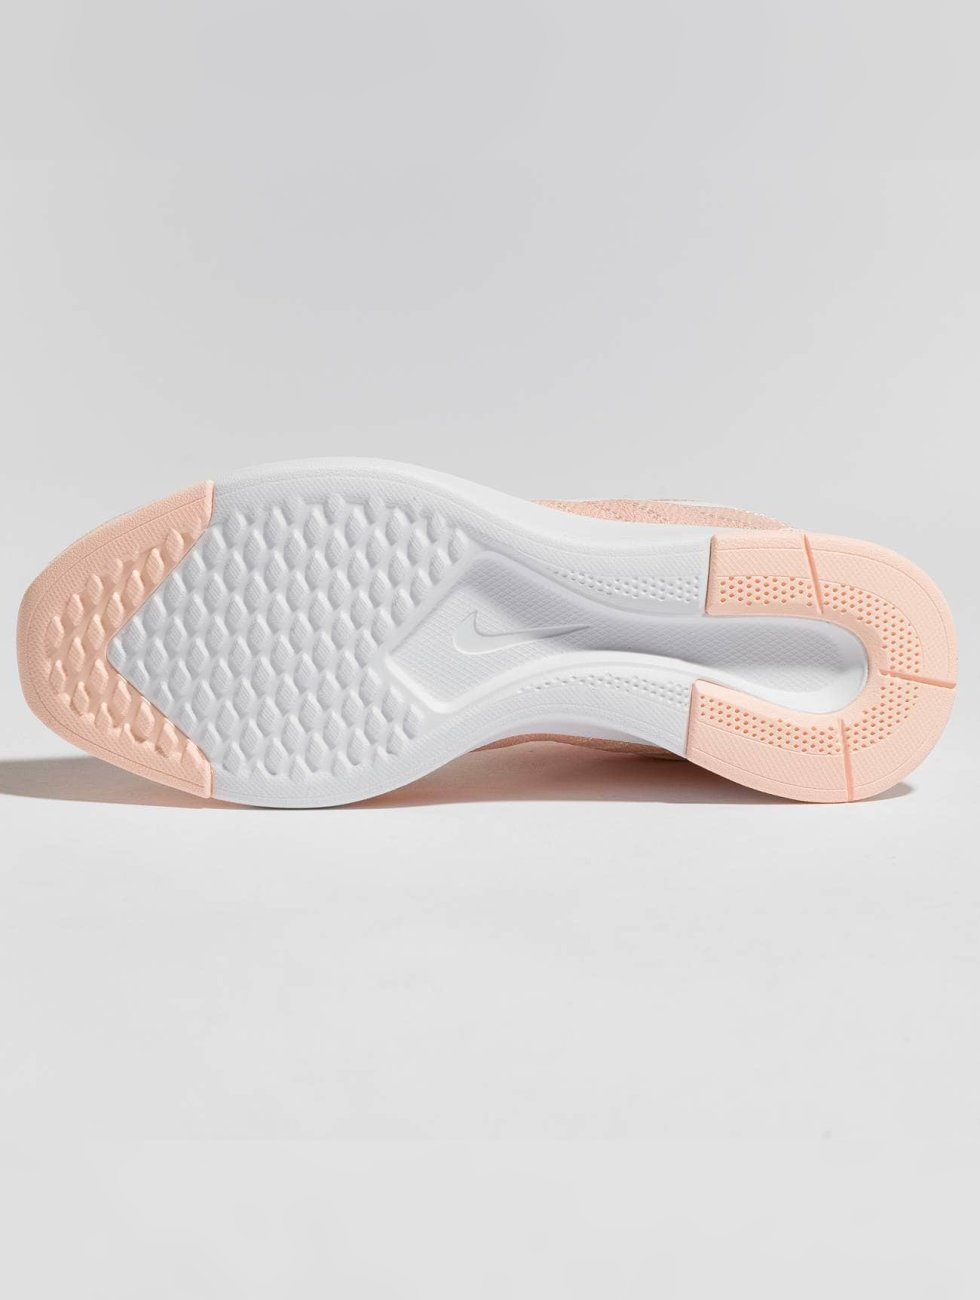 Nike Pattino / Sneaker Nike Sb Doppio Tono Pilota Se (gs) In Rosso 442 593 wjDC9t8